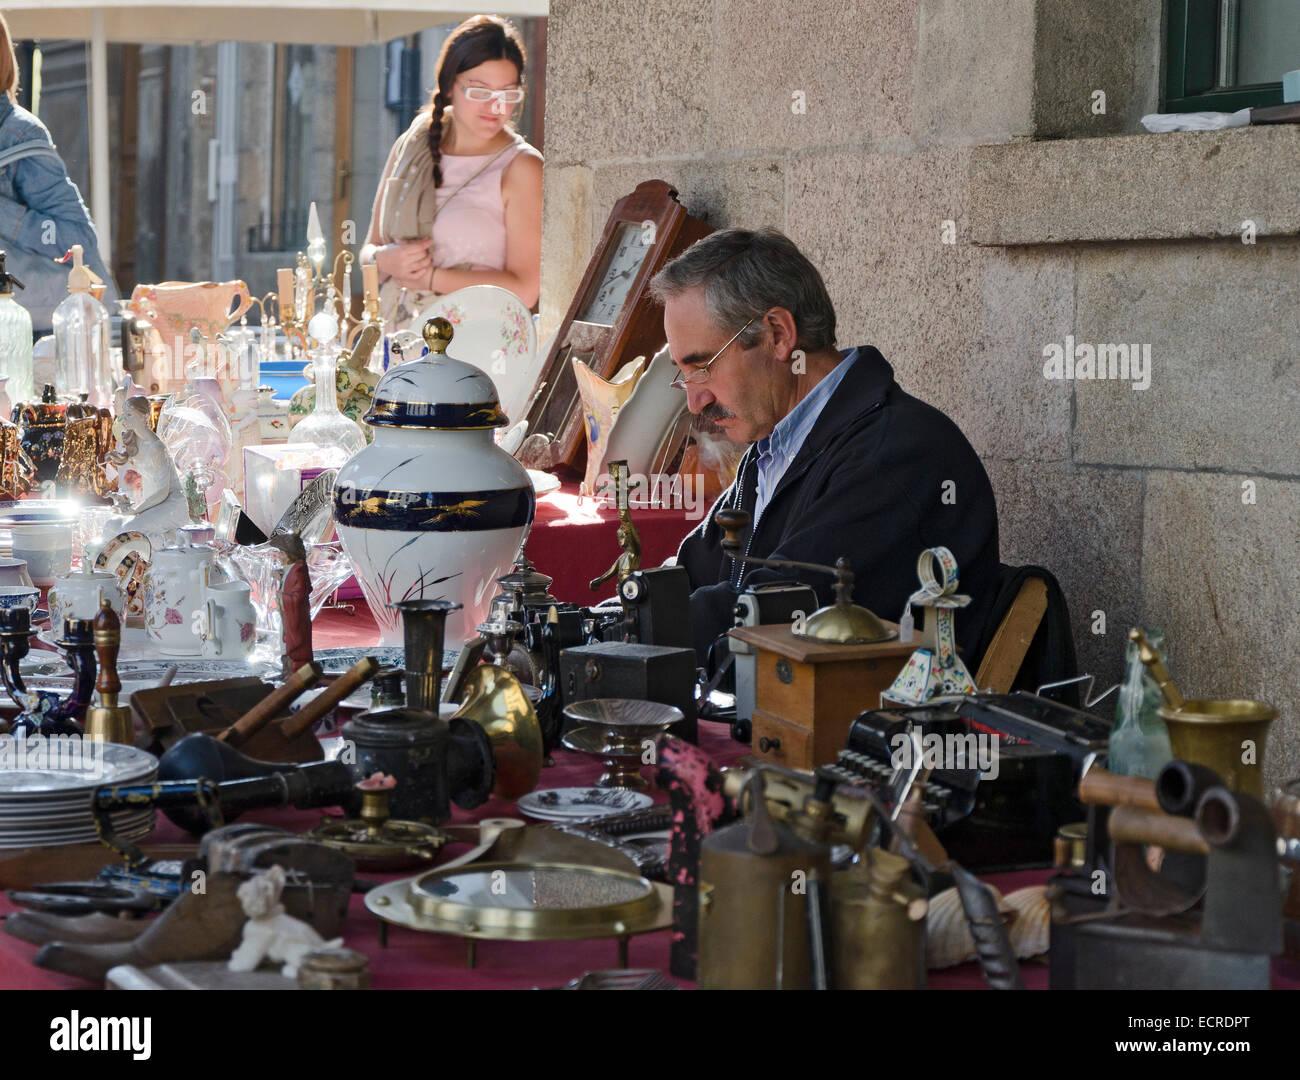 SANTIAGO DE COMPOSTELA, SPAIN – SEPTEMBER 8, 2012: A secondhand dealer sells stuff in a street market in Santiago - Stock Image